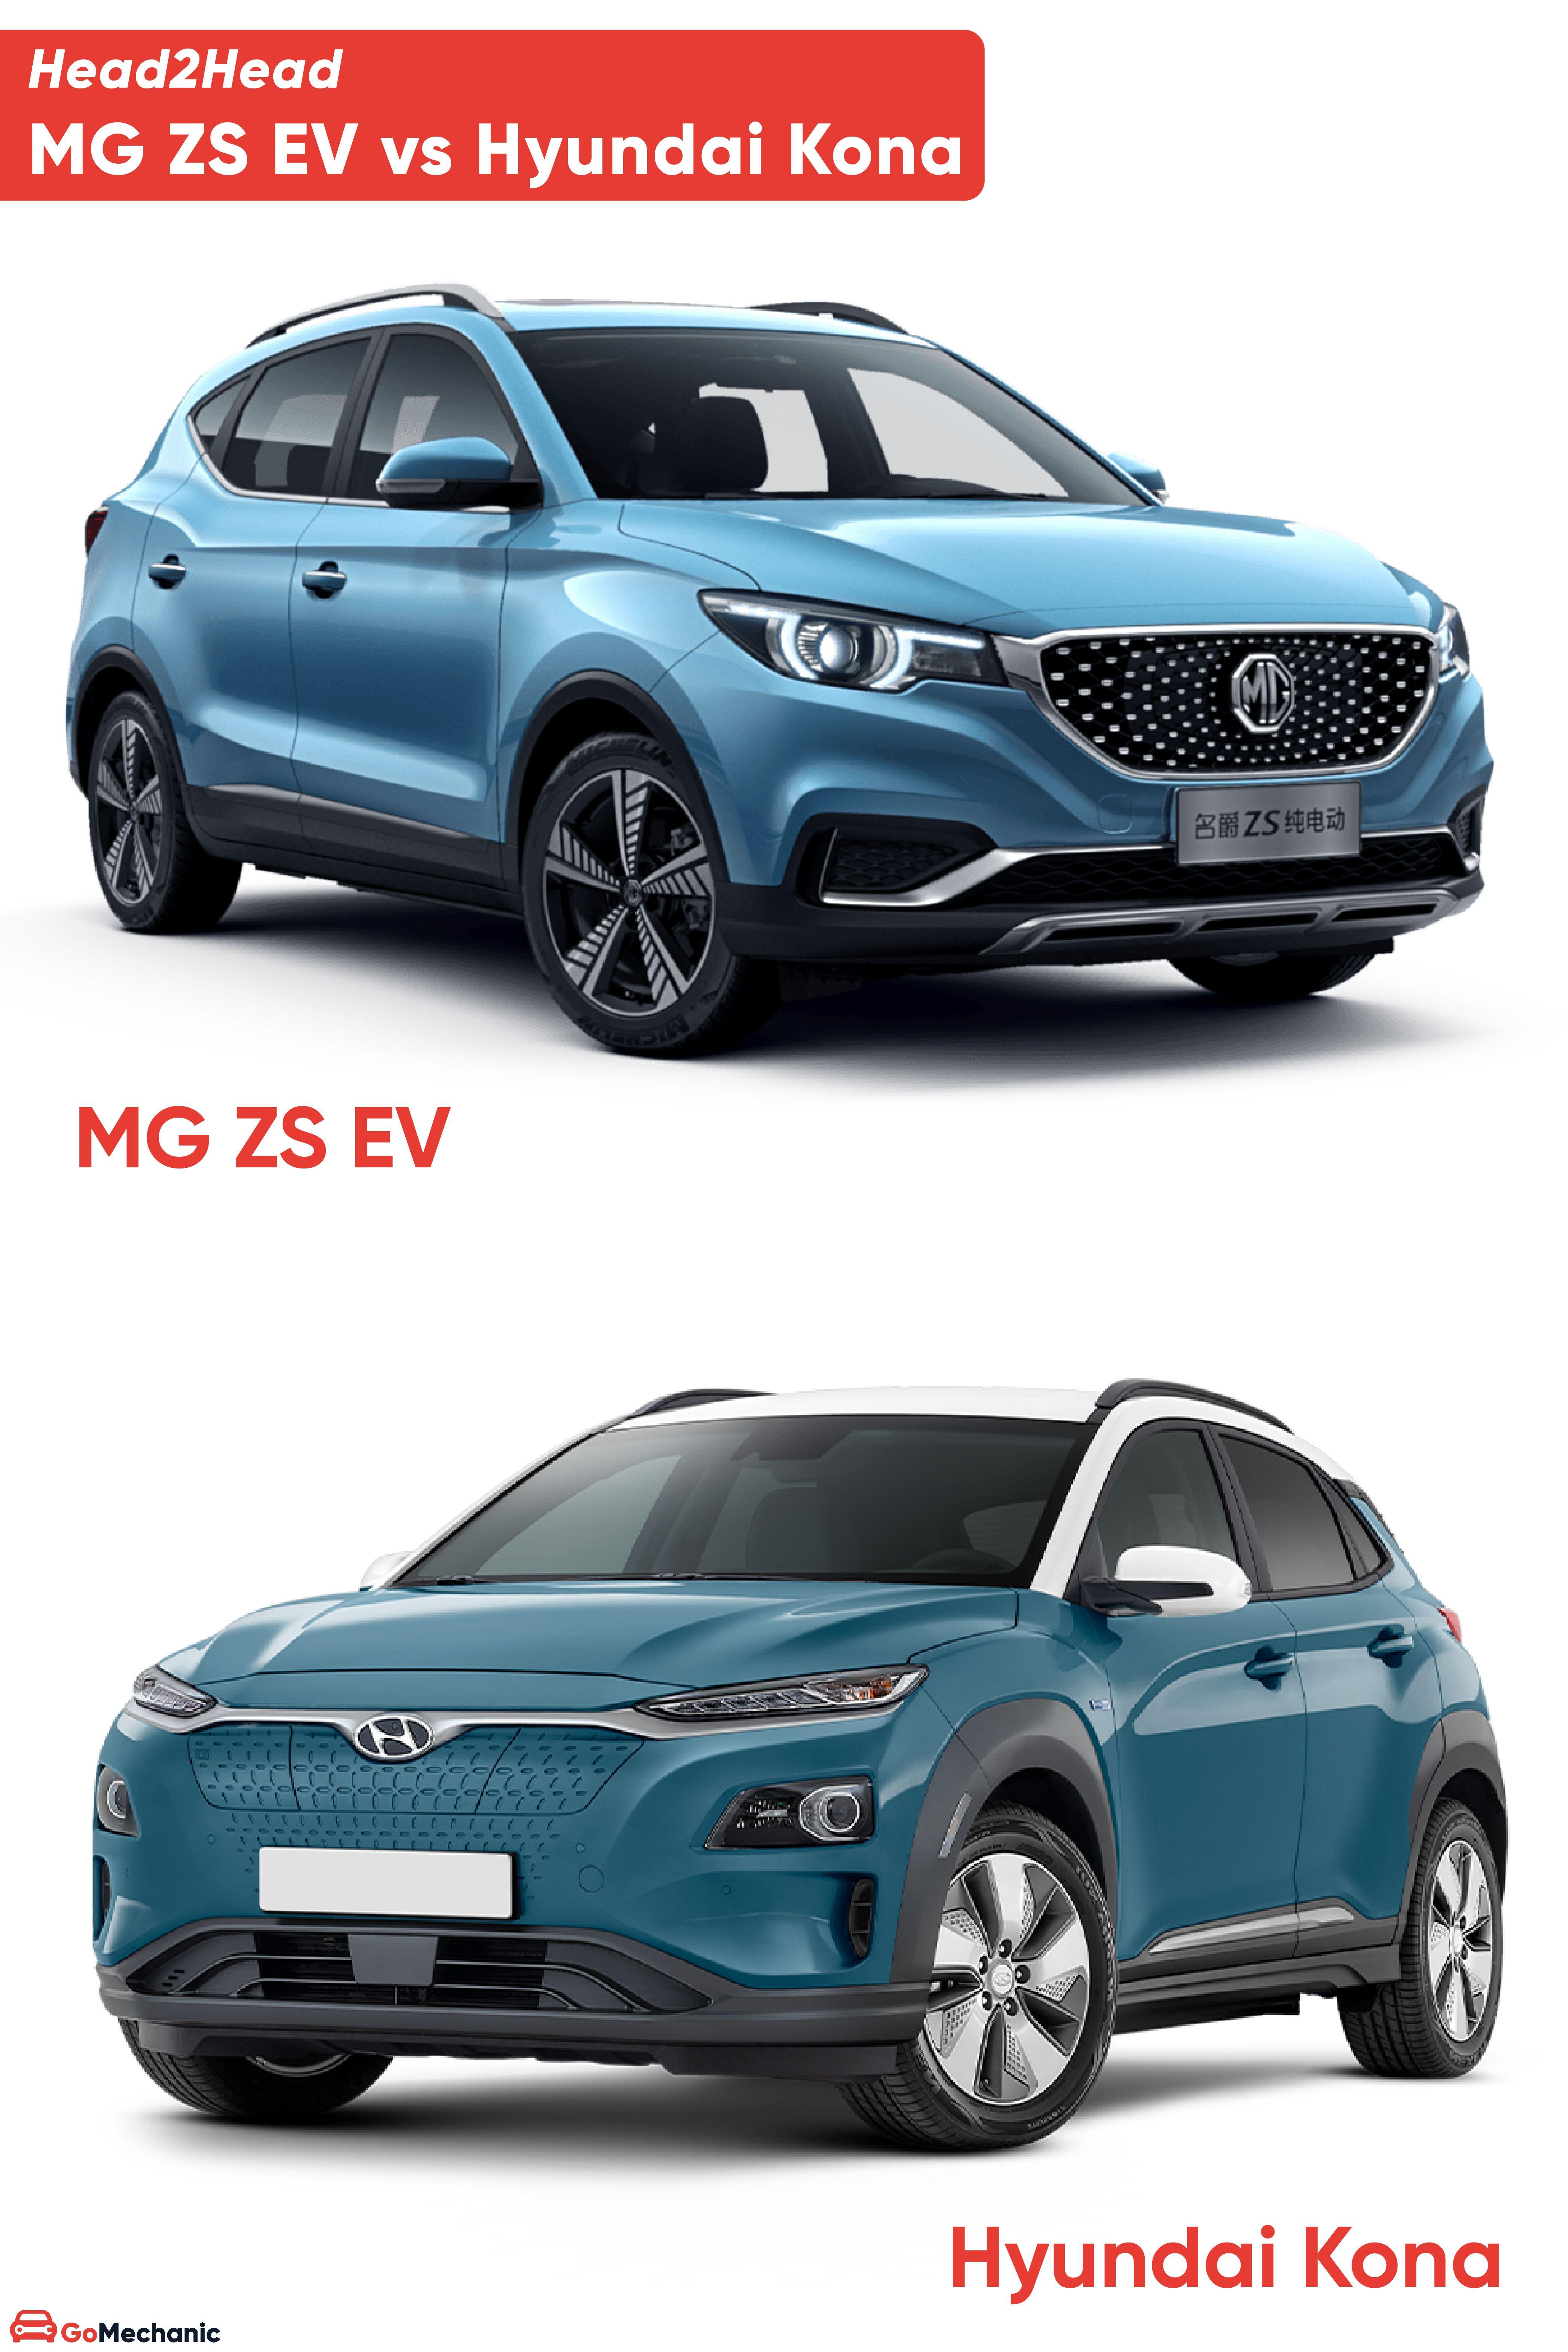 Hyundai Kona Vs Mg Zs Ev Head To Head In 2020 Hyundai Electric Cars In India Best Electric Car